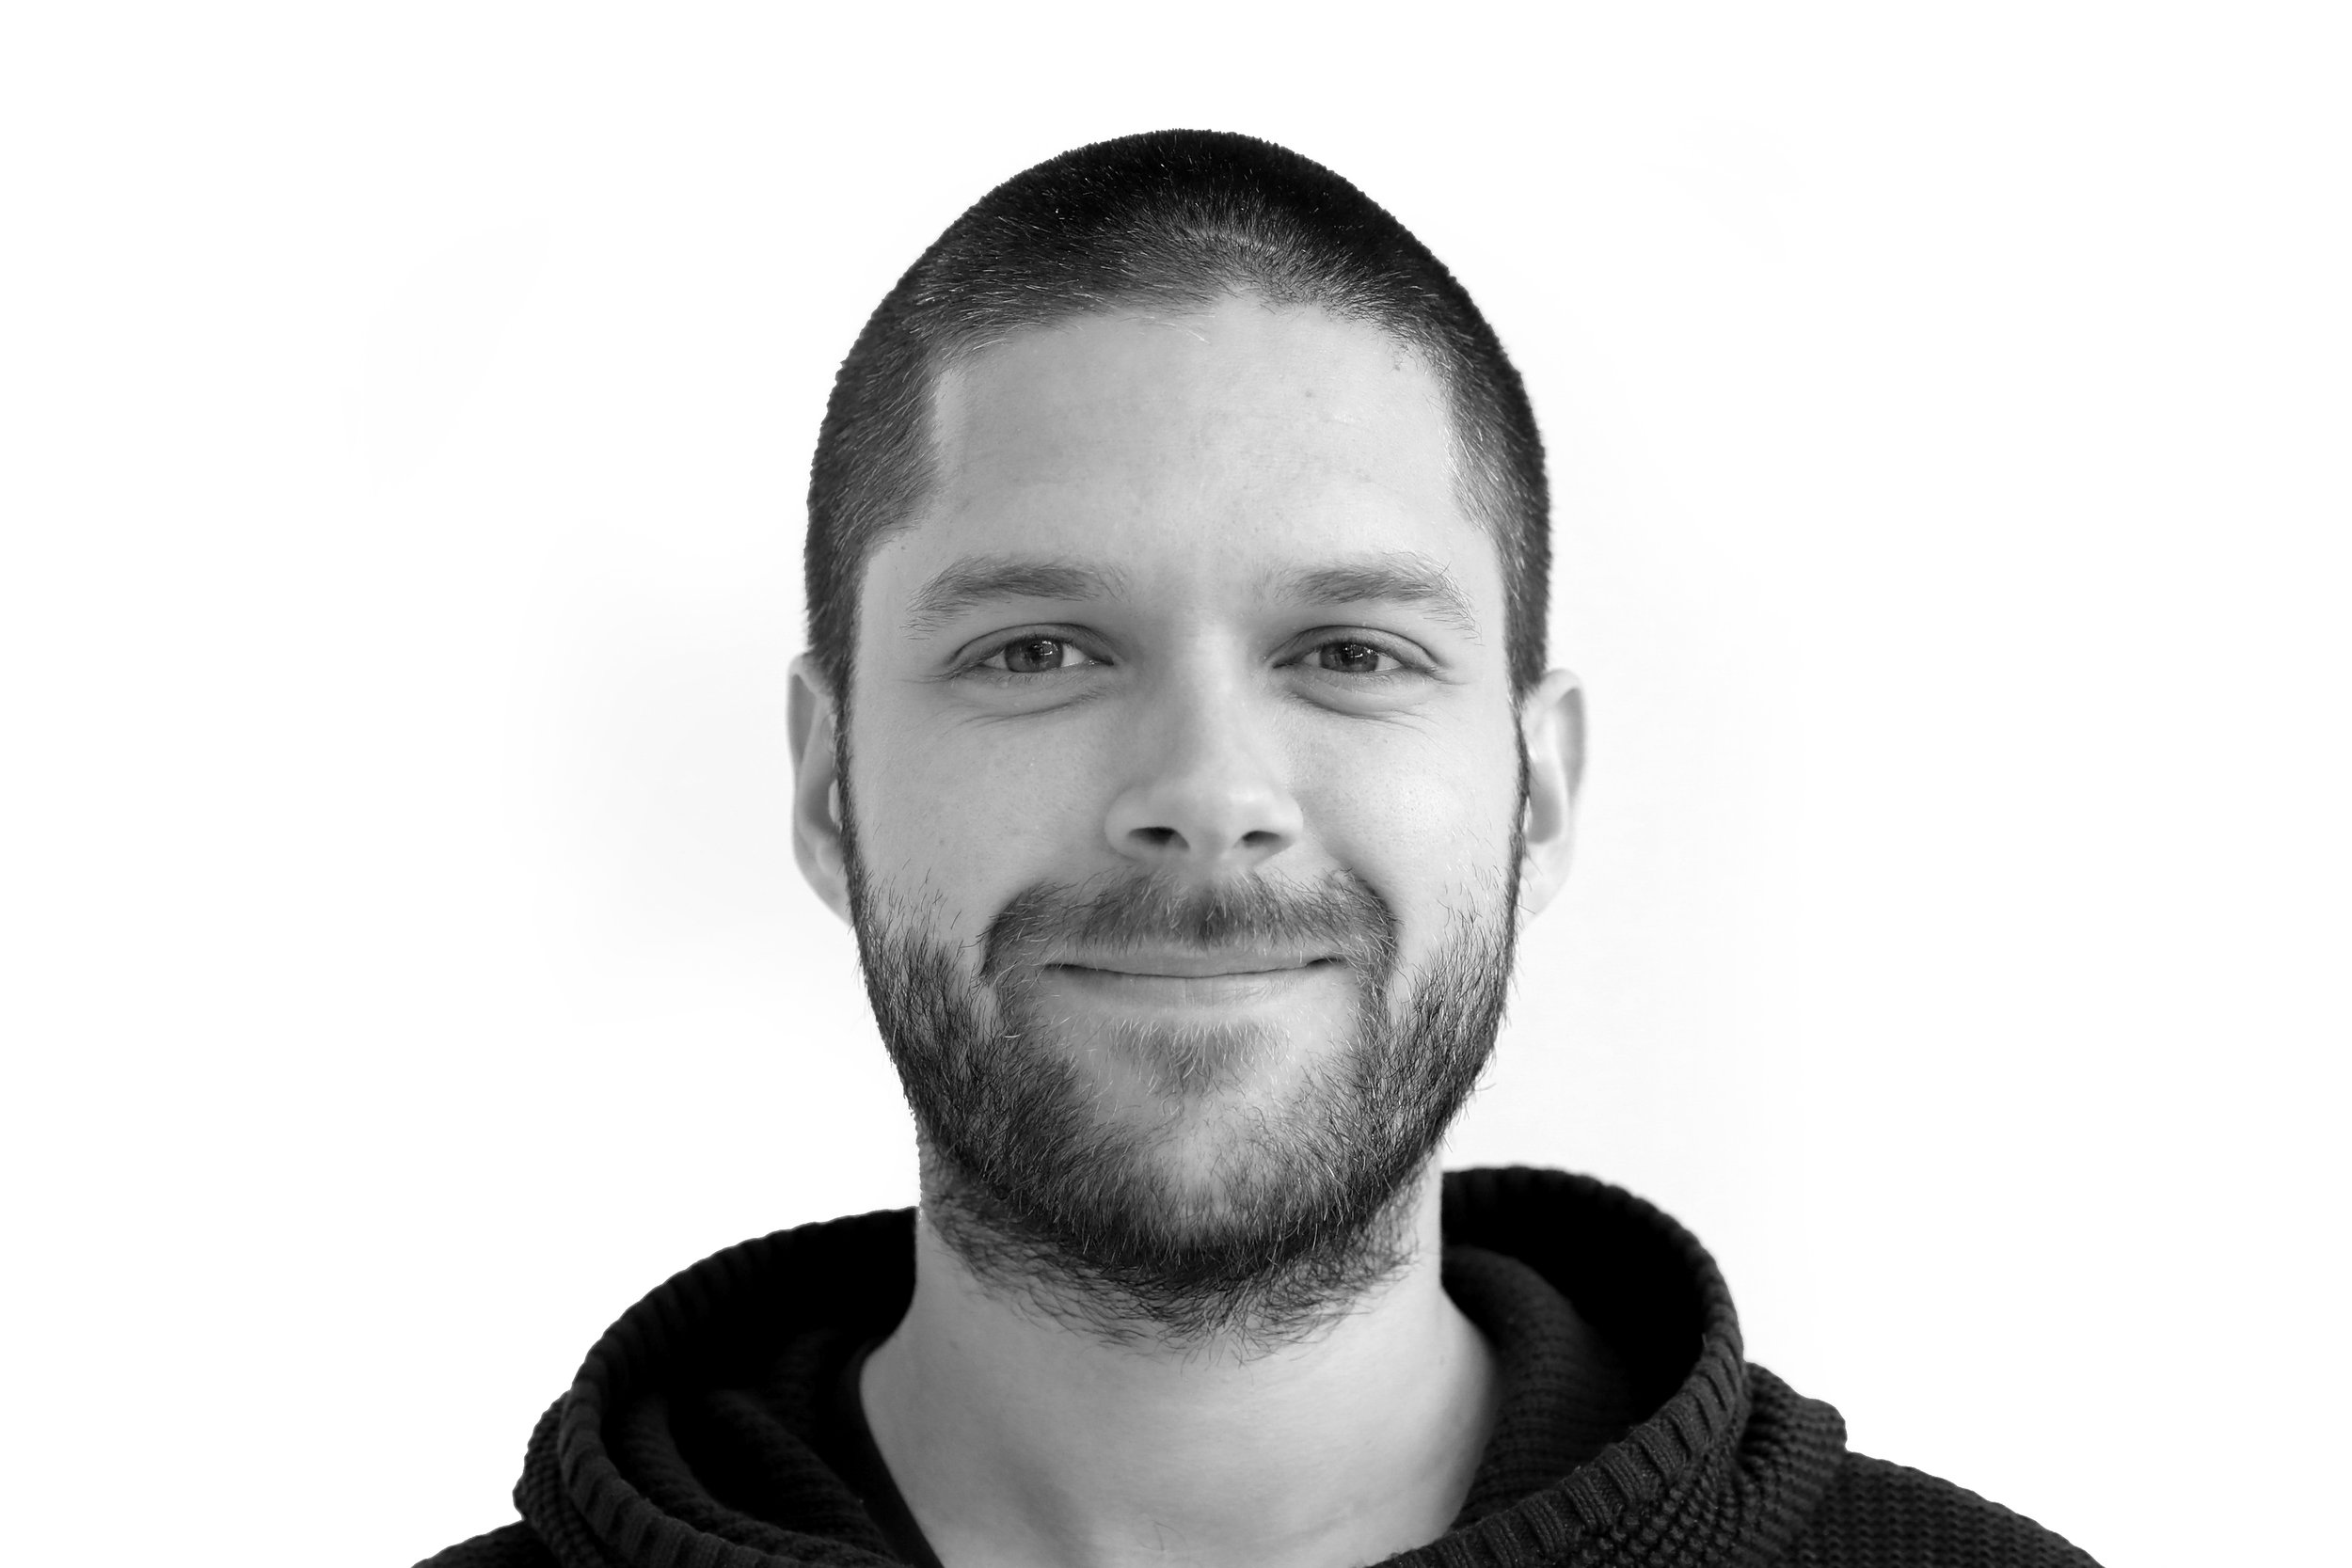 Felix-Cropped.jpg